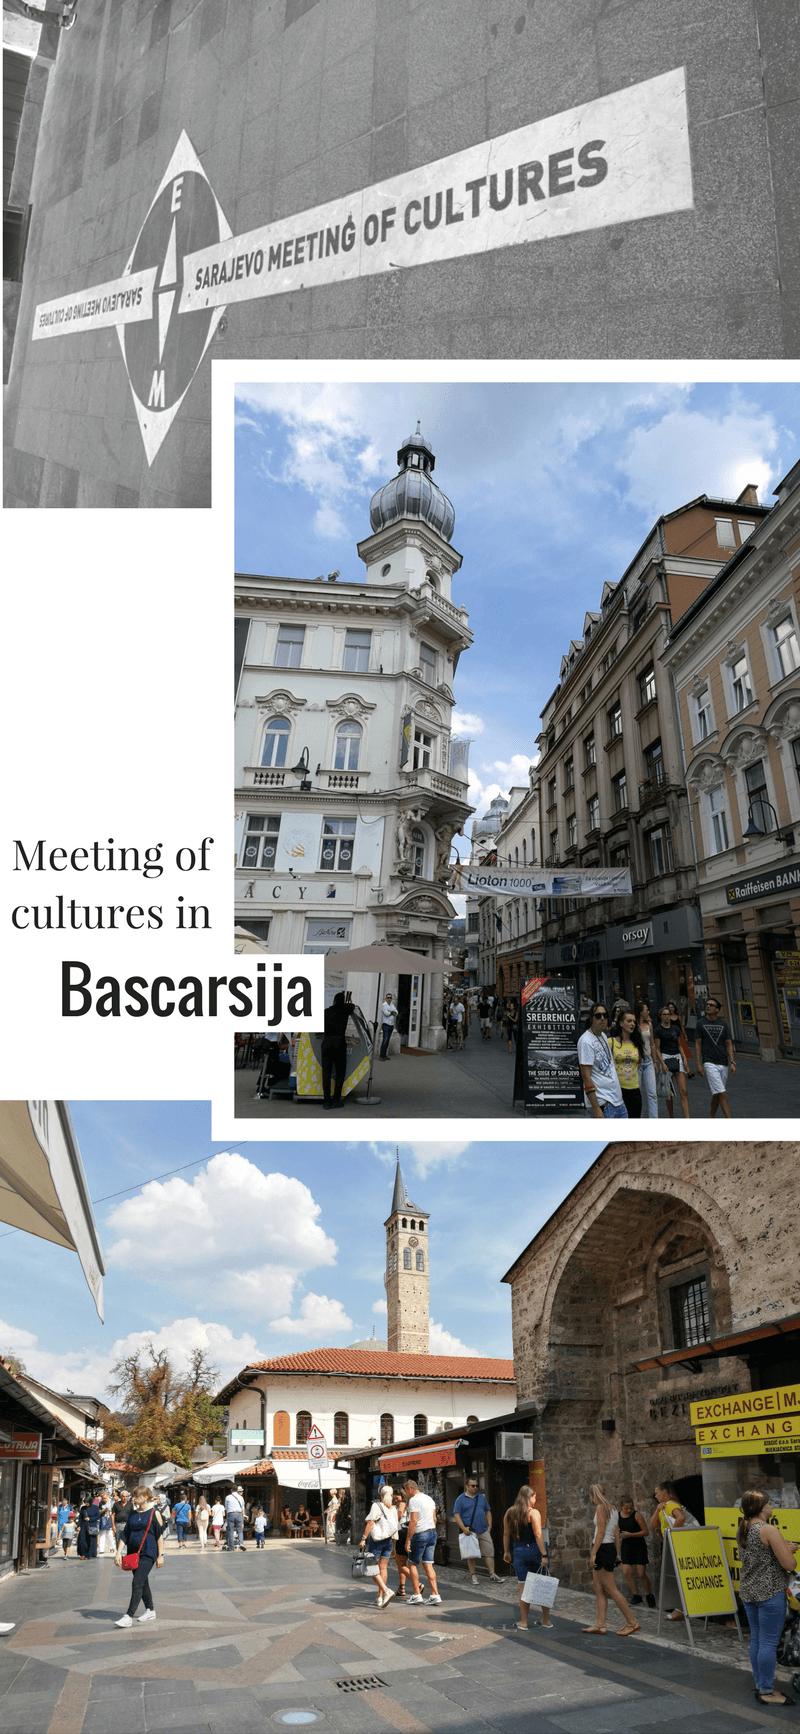 Städtereise_Sarajevo_Bascarsija